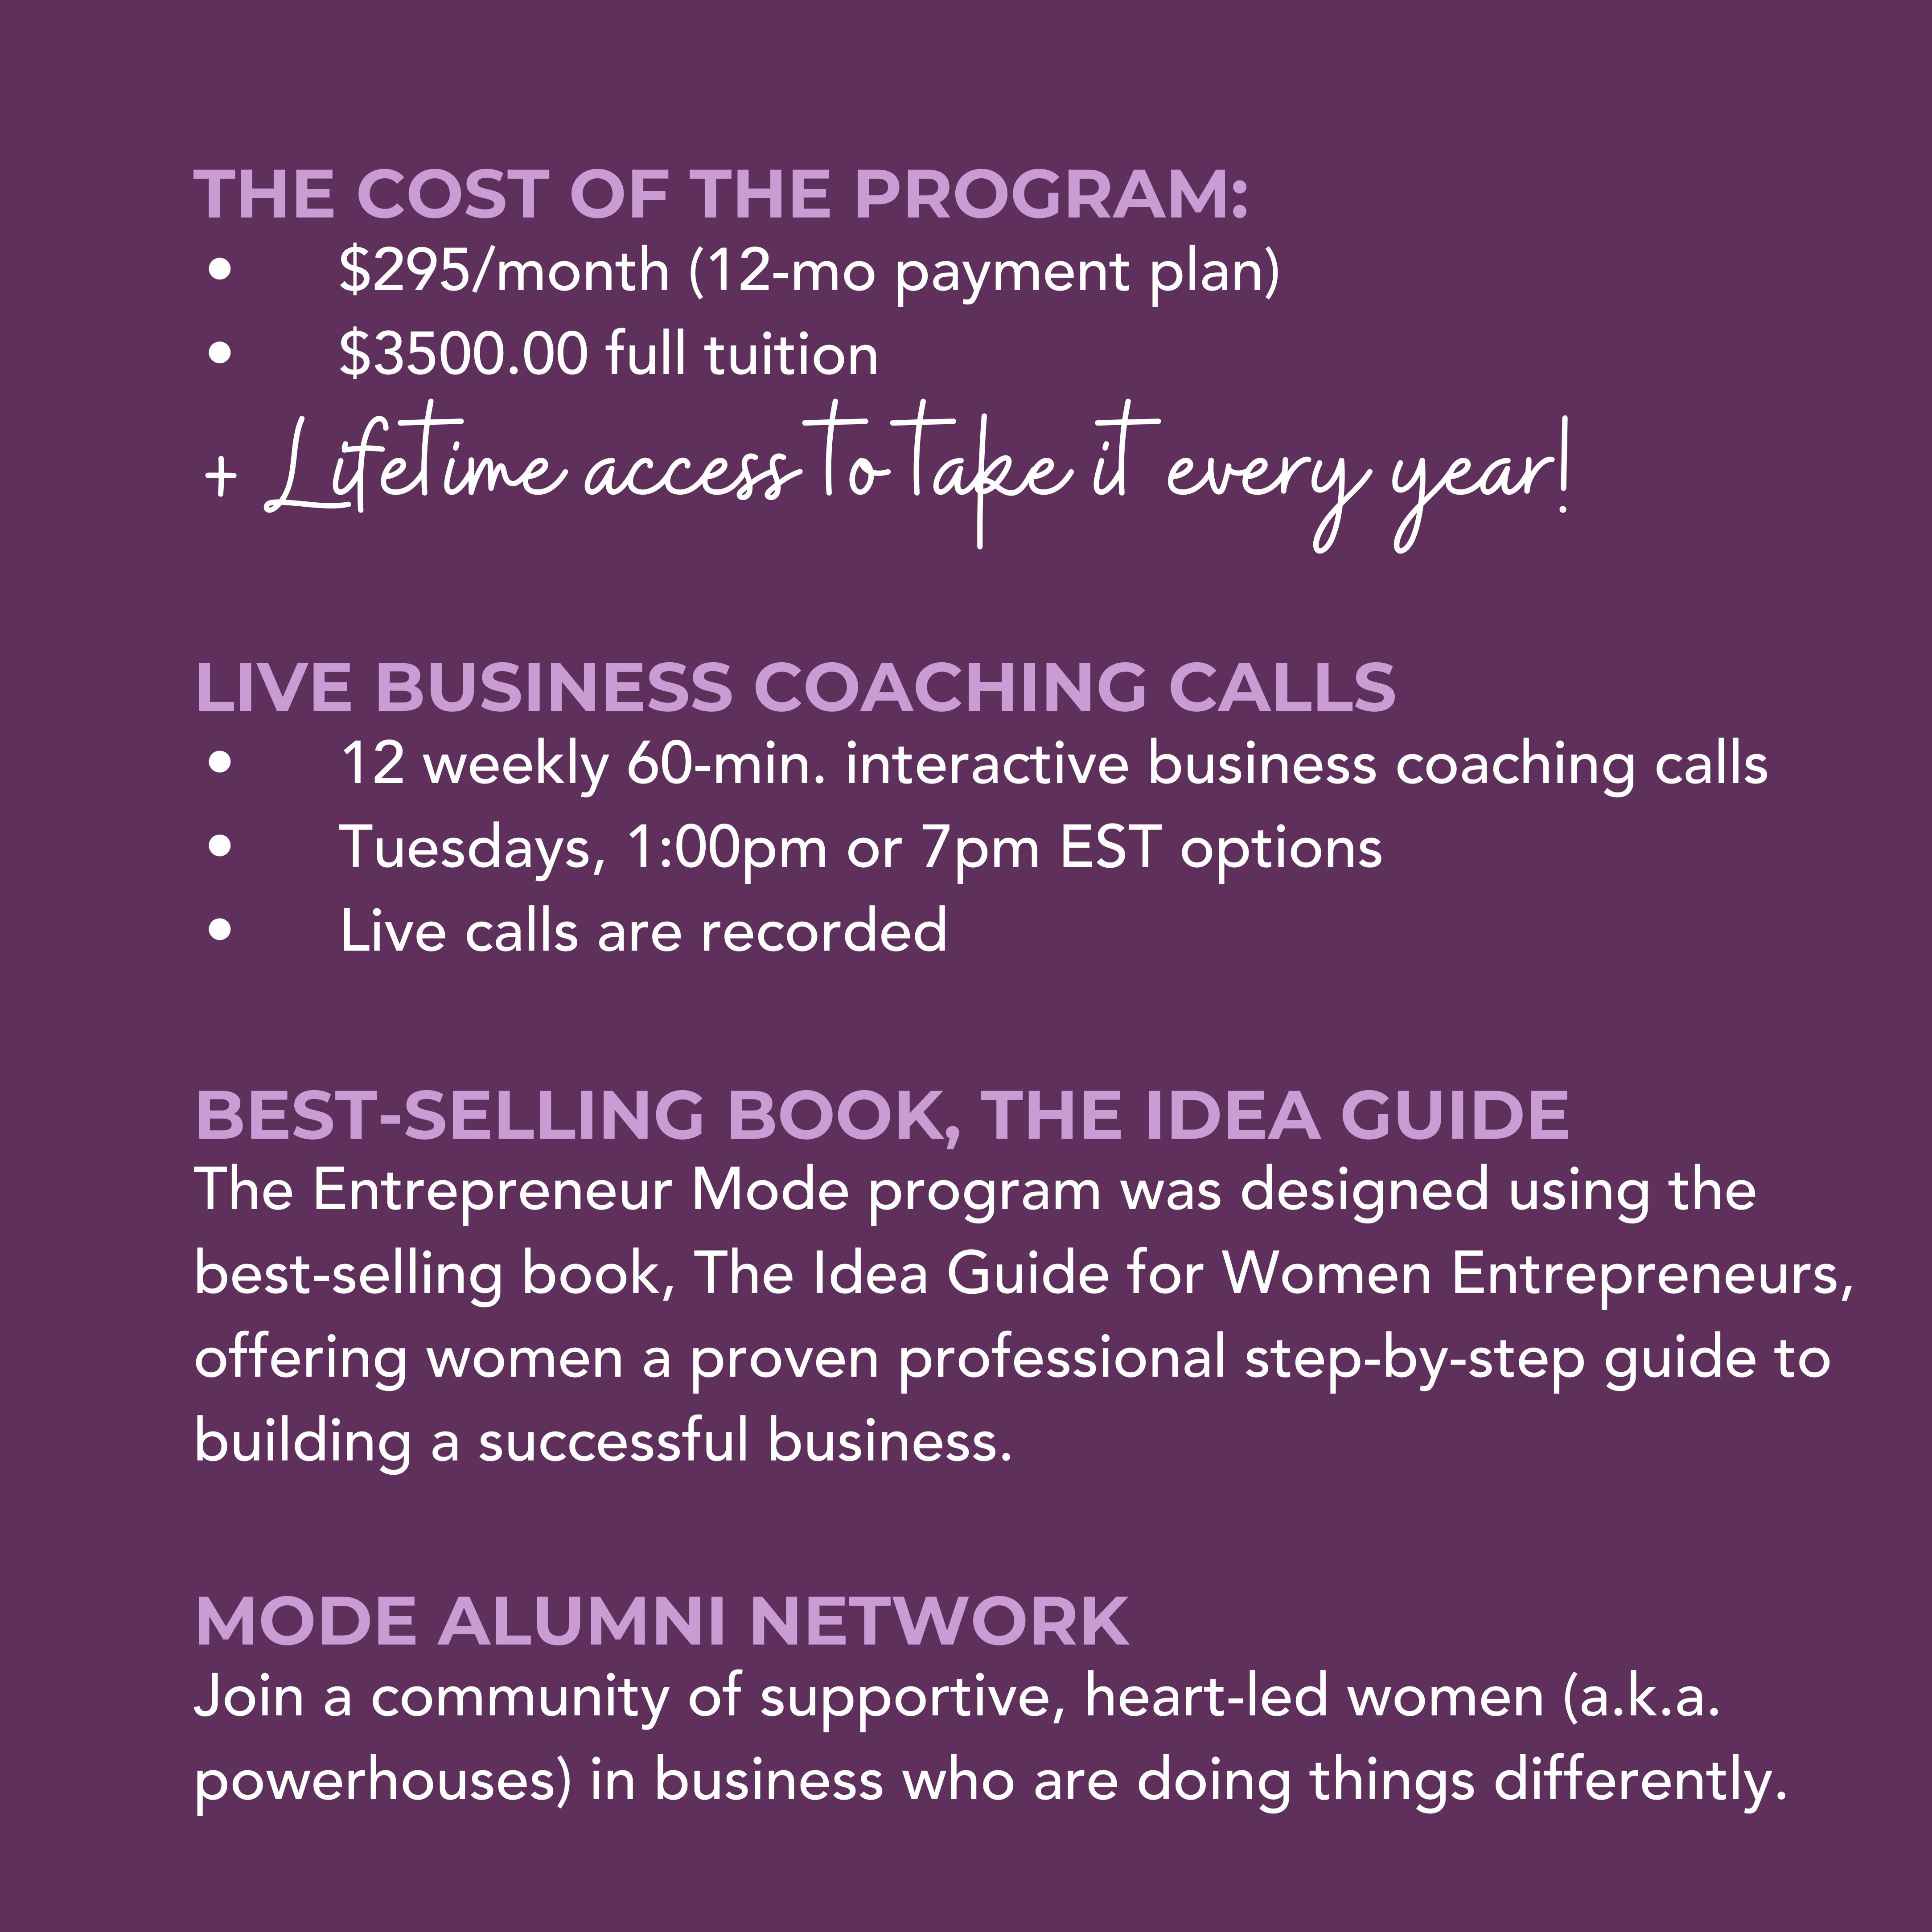 Program start dates, class call schedule and mentorship call schedule